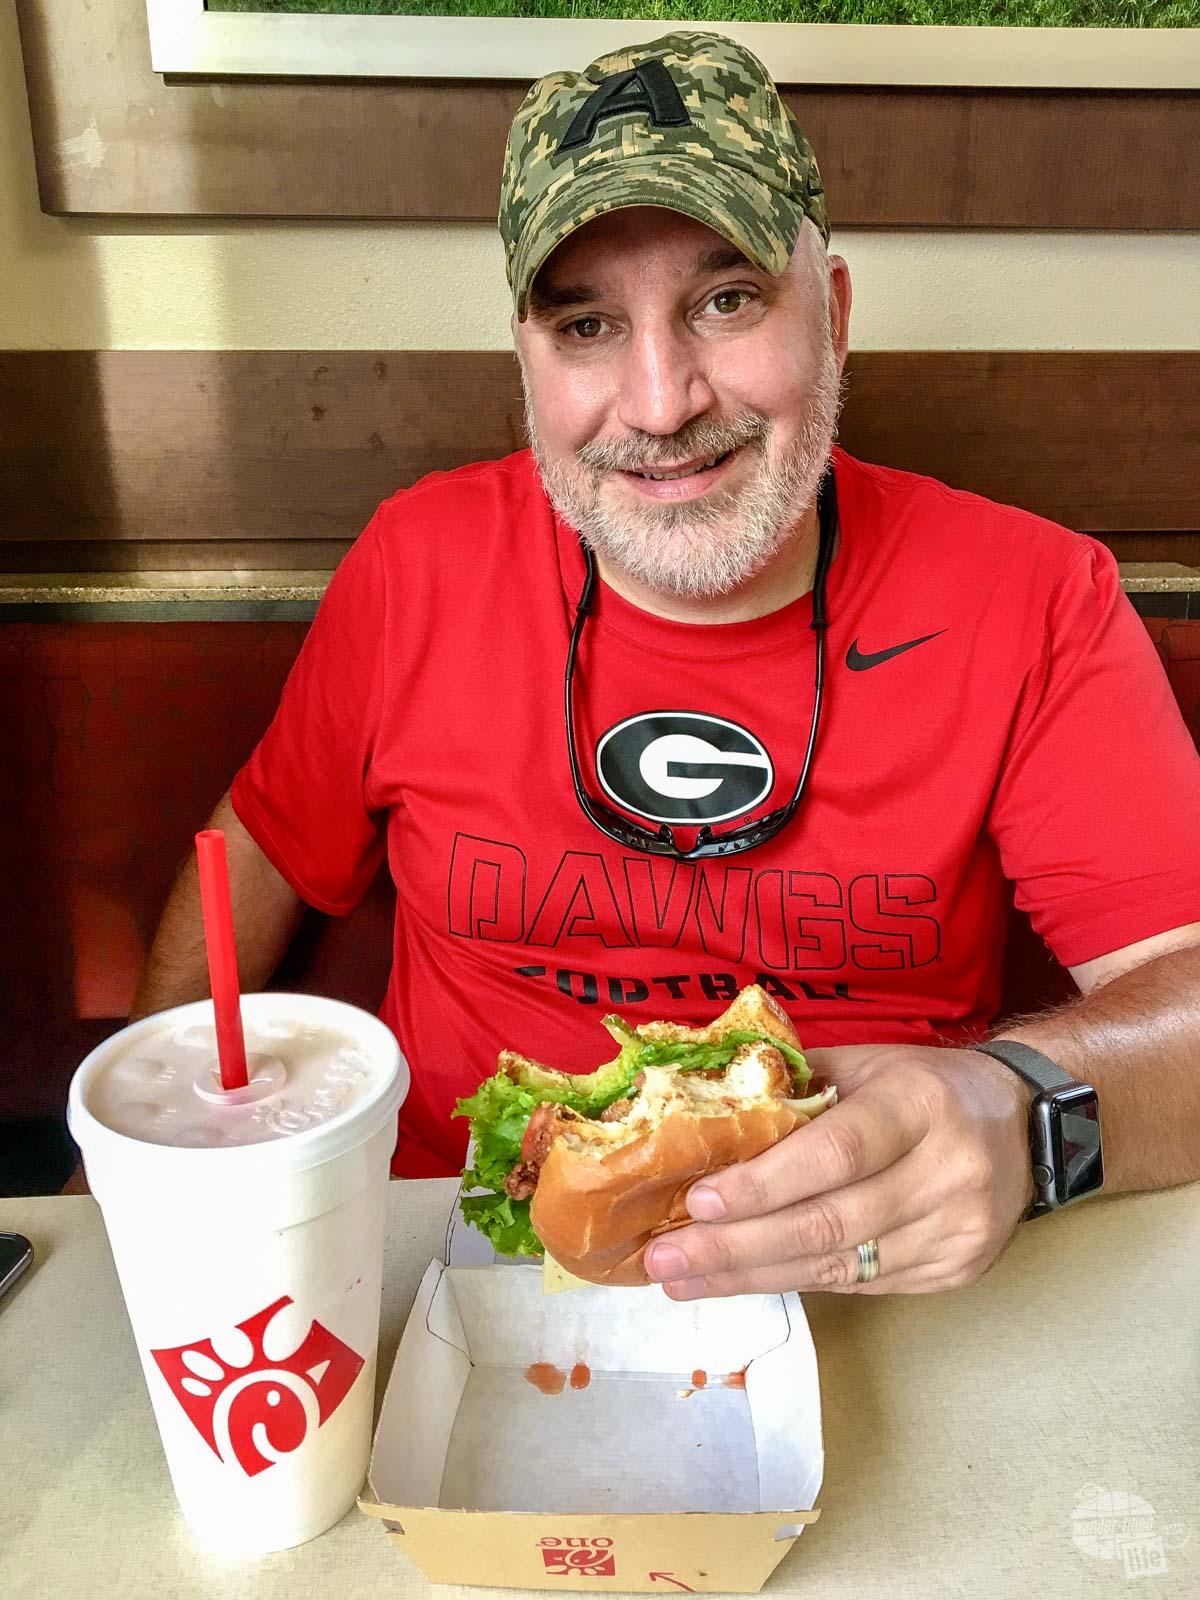 Grant enjoying a chicken sandwich at Chick-fil-A.